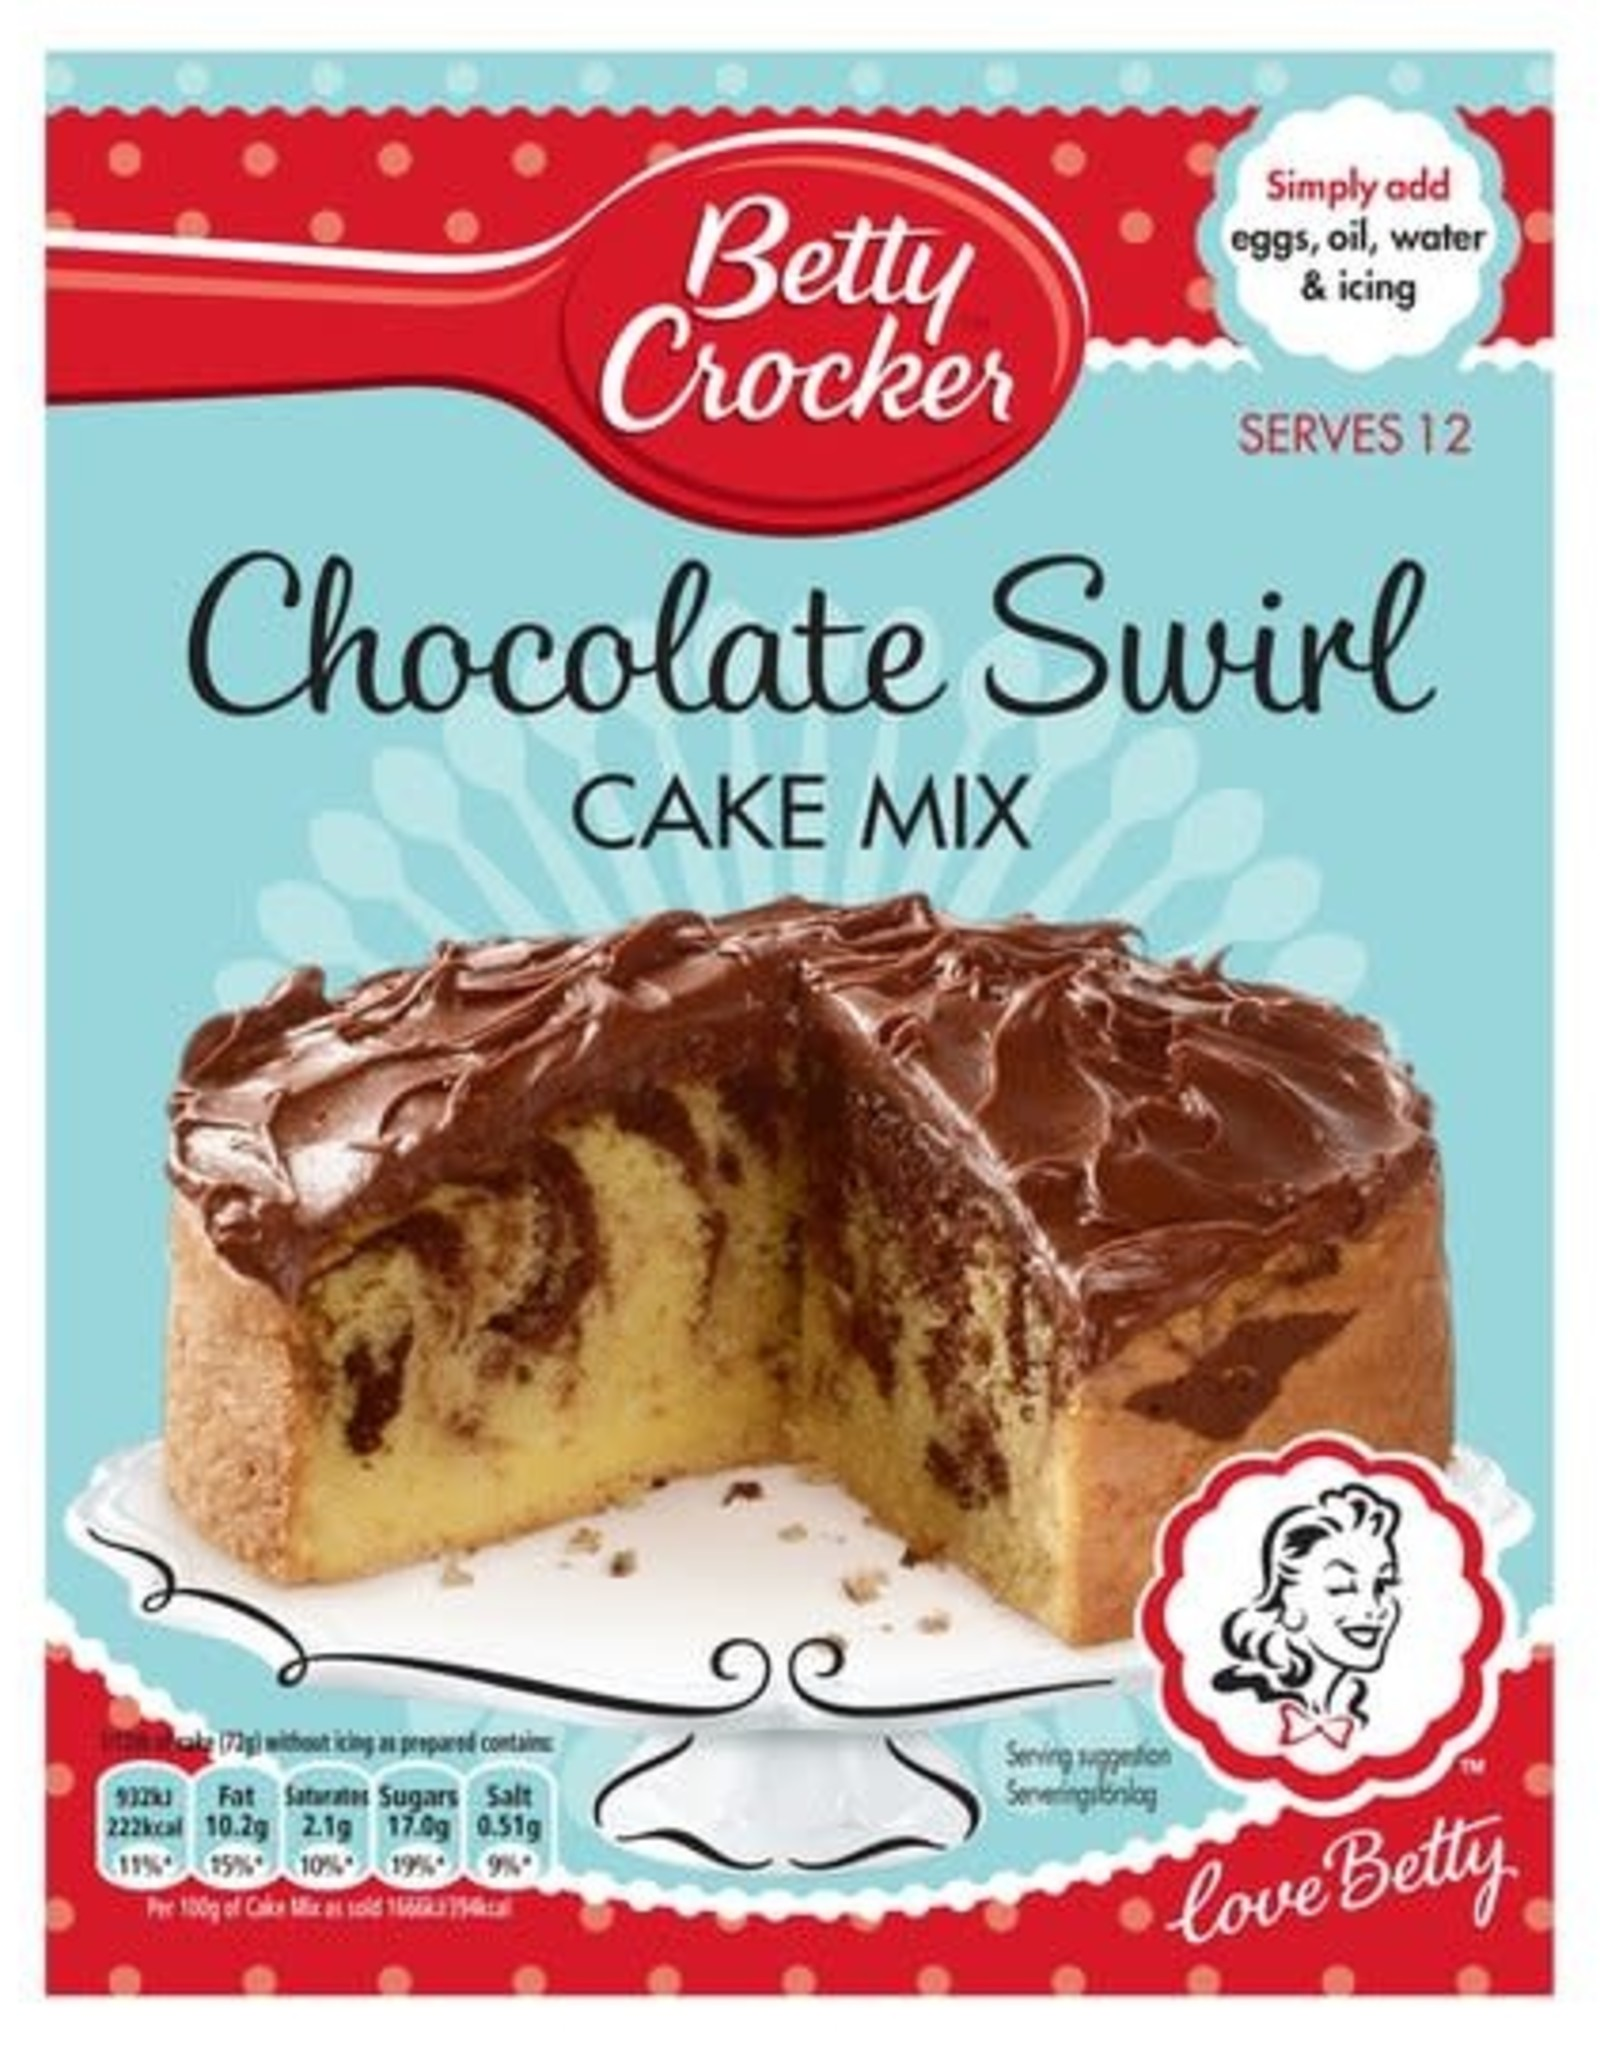 Betty Crocker Betty Crocker Chocolate Swirl Cake Mix